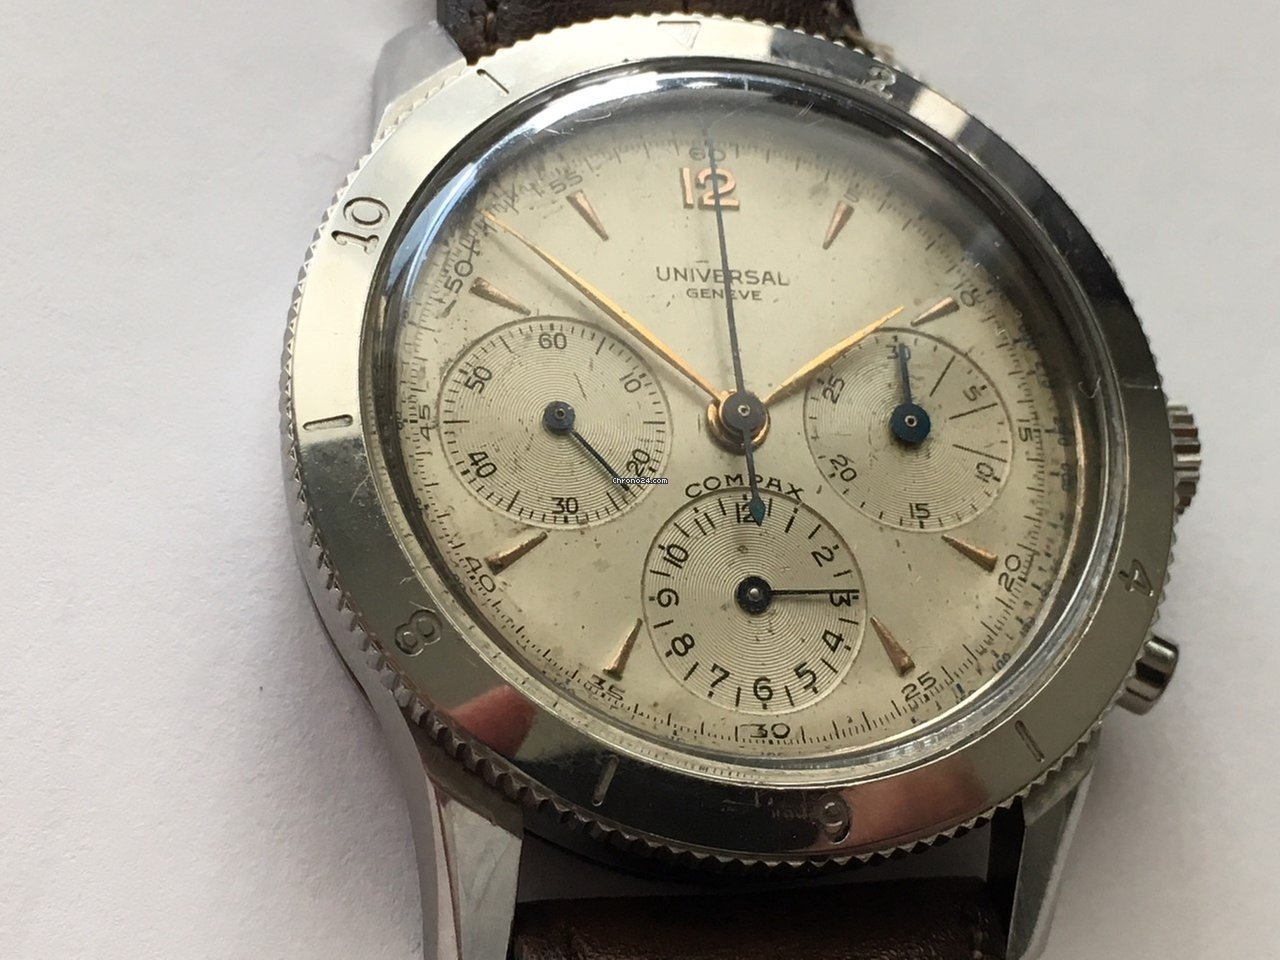 ff9a02c8751 Comprar relógios Universal Genève